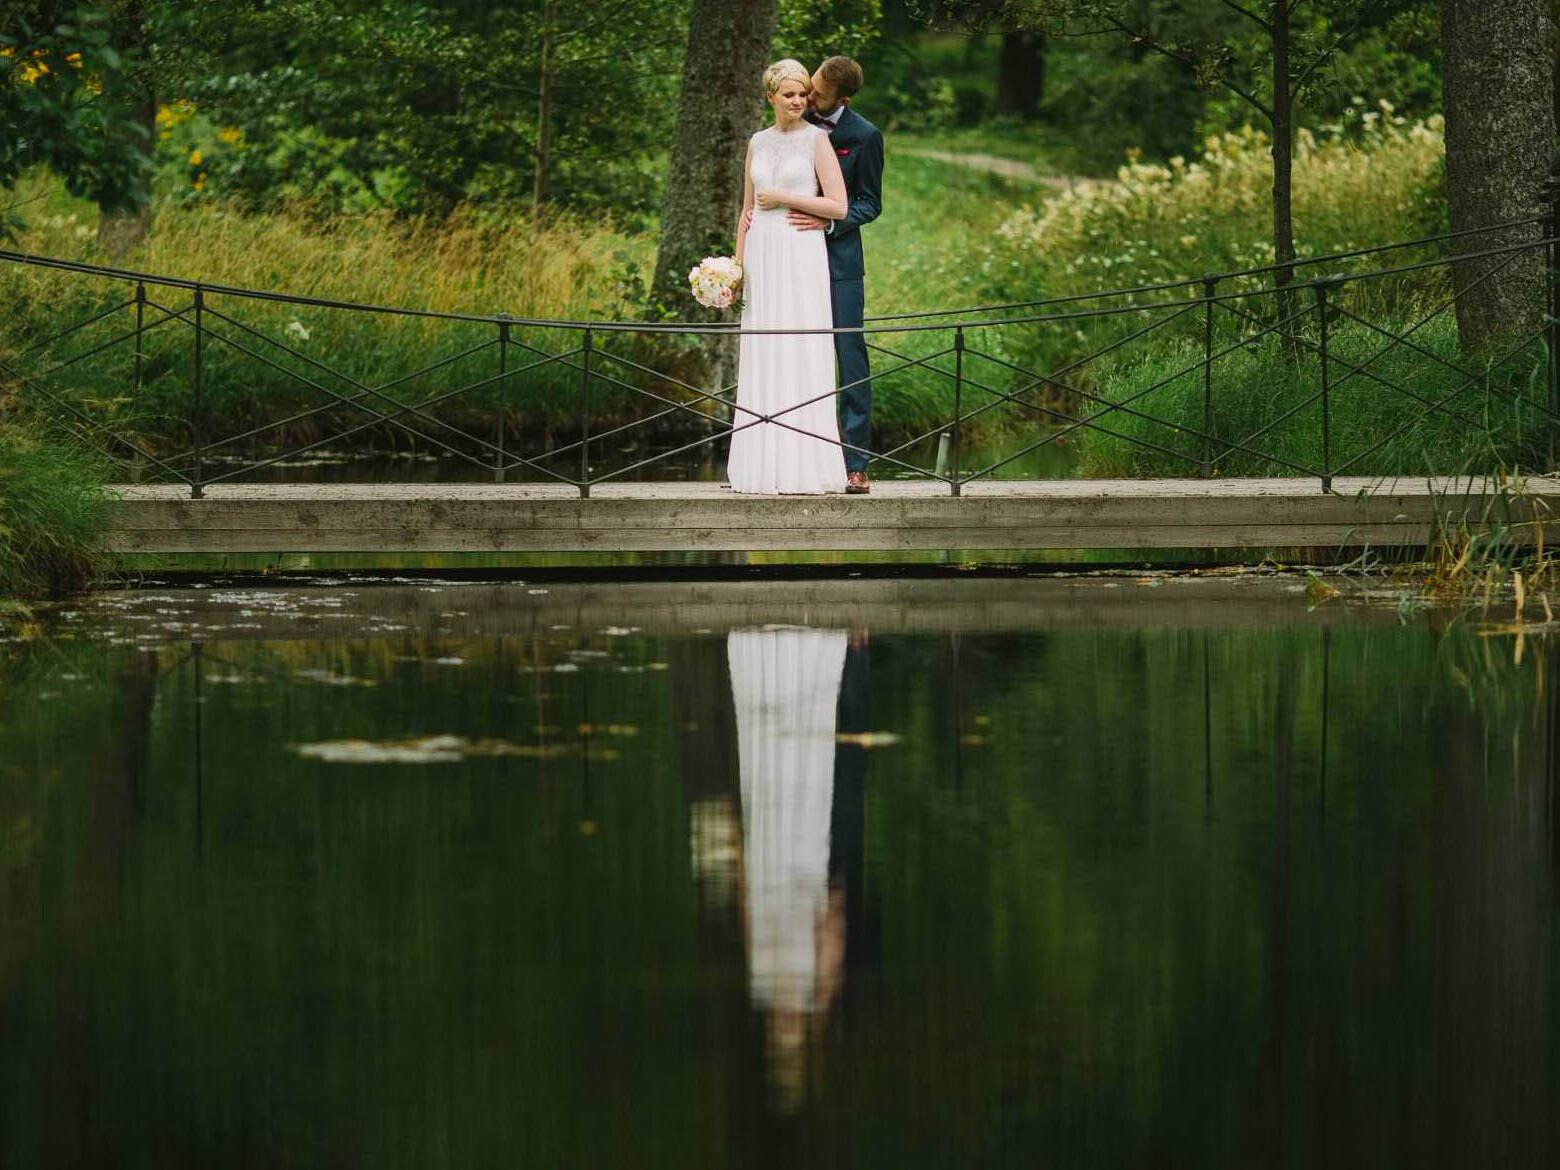 Bröllopsfotograf Stockholm Västerås